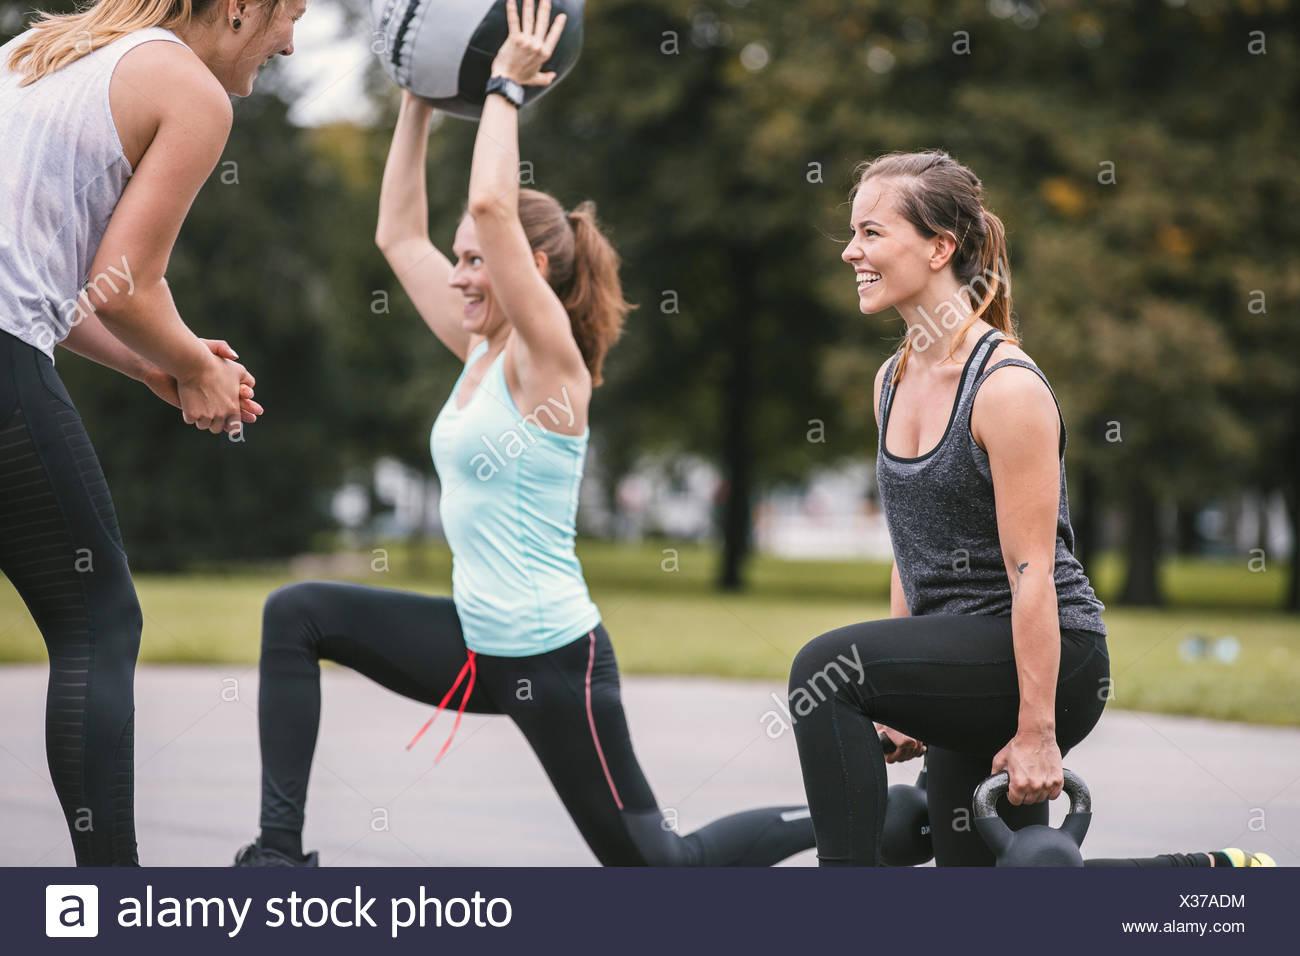 Three women having an outdoor boot camp workout Stock Photo